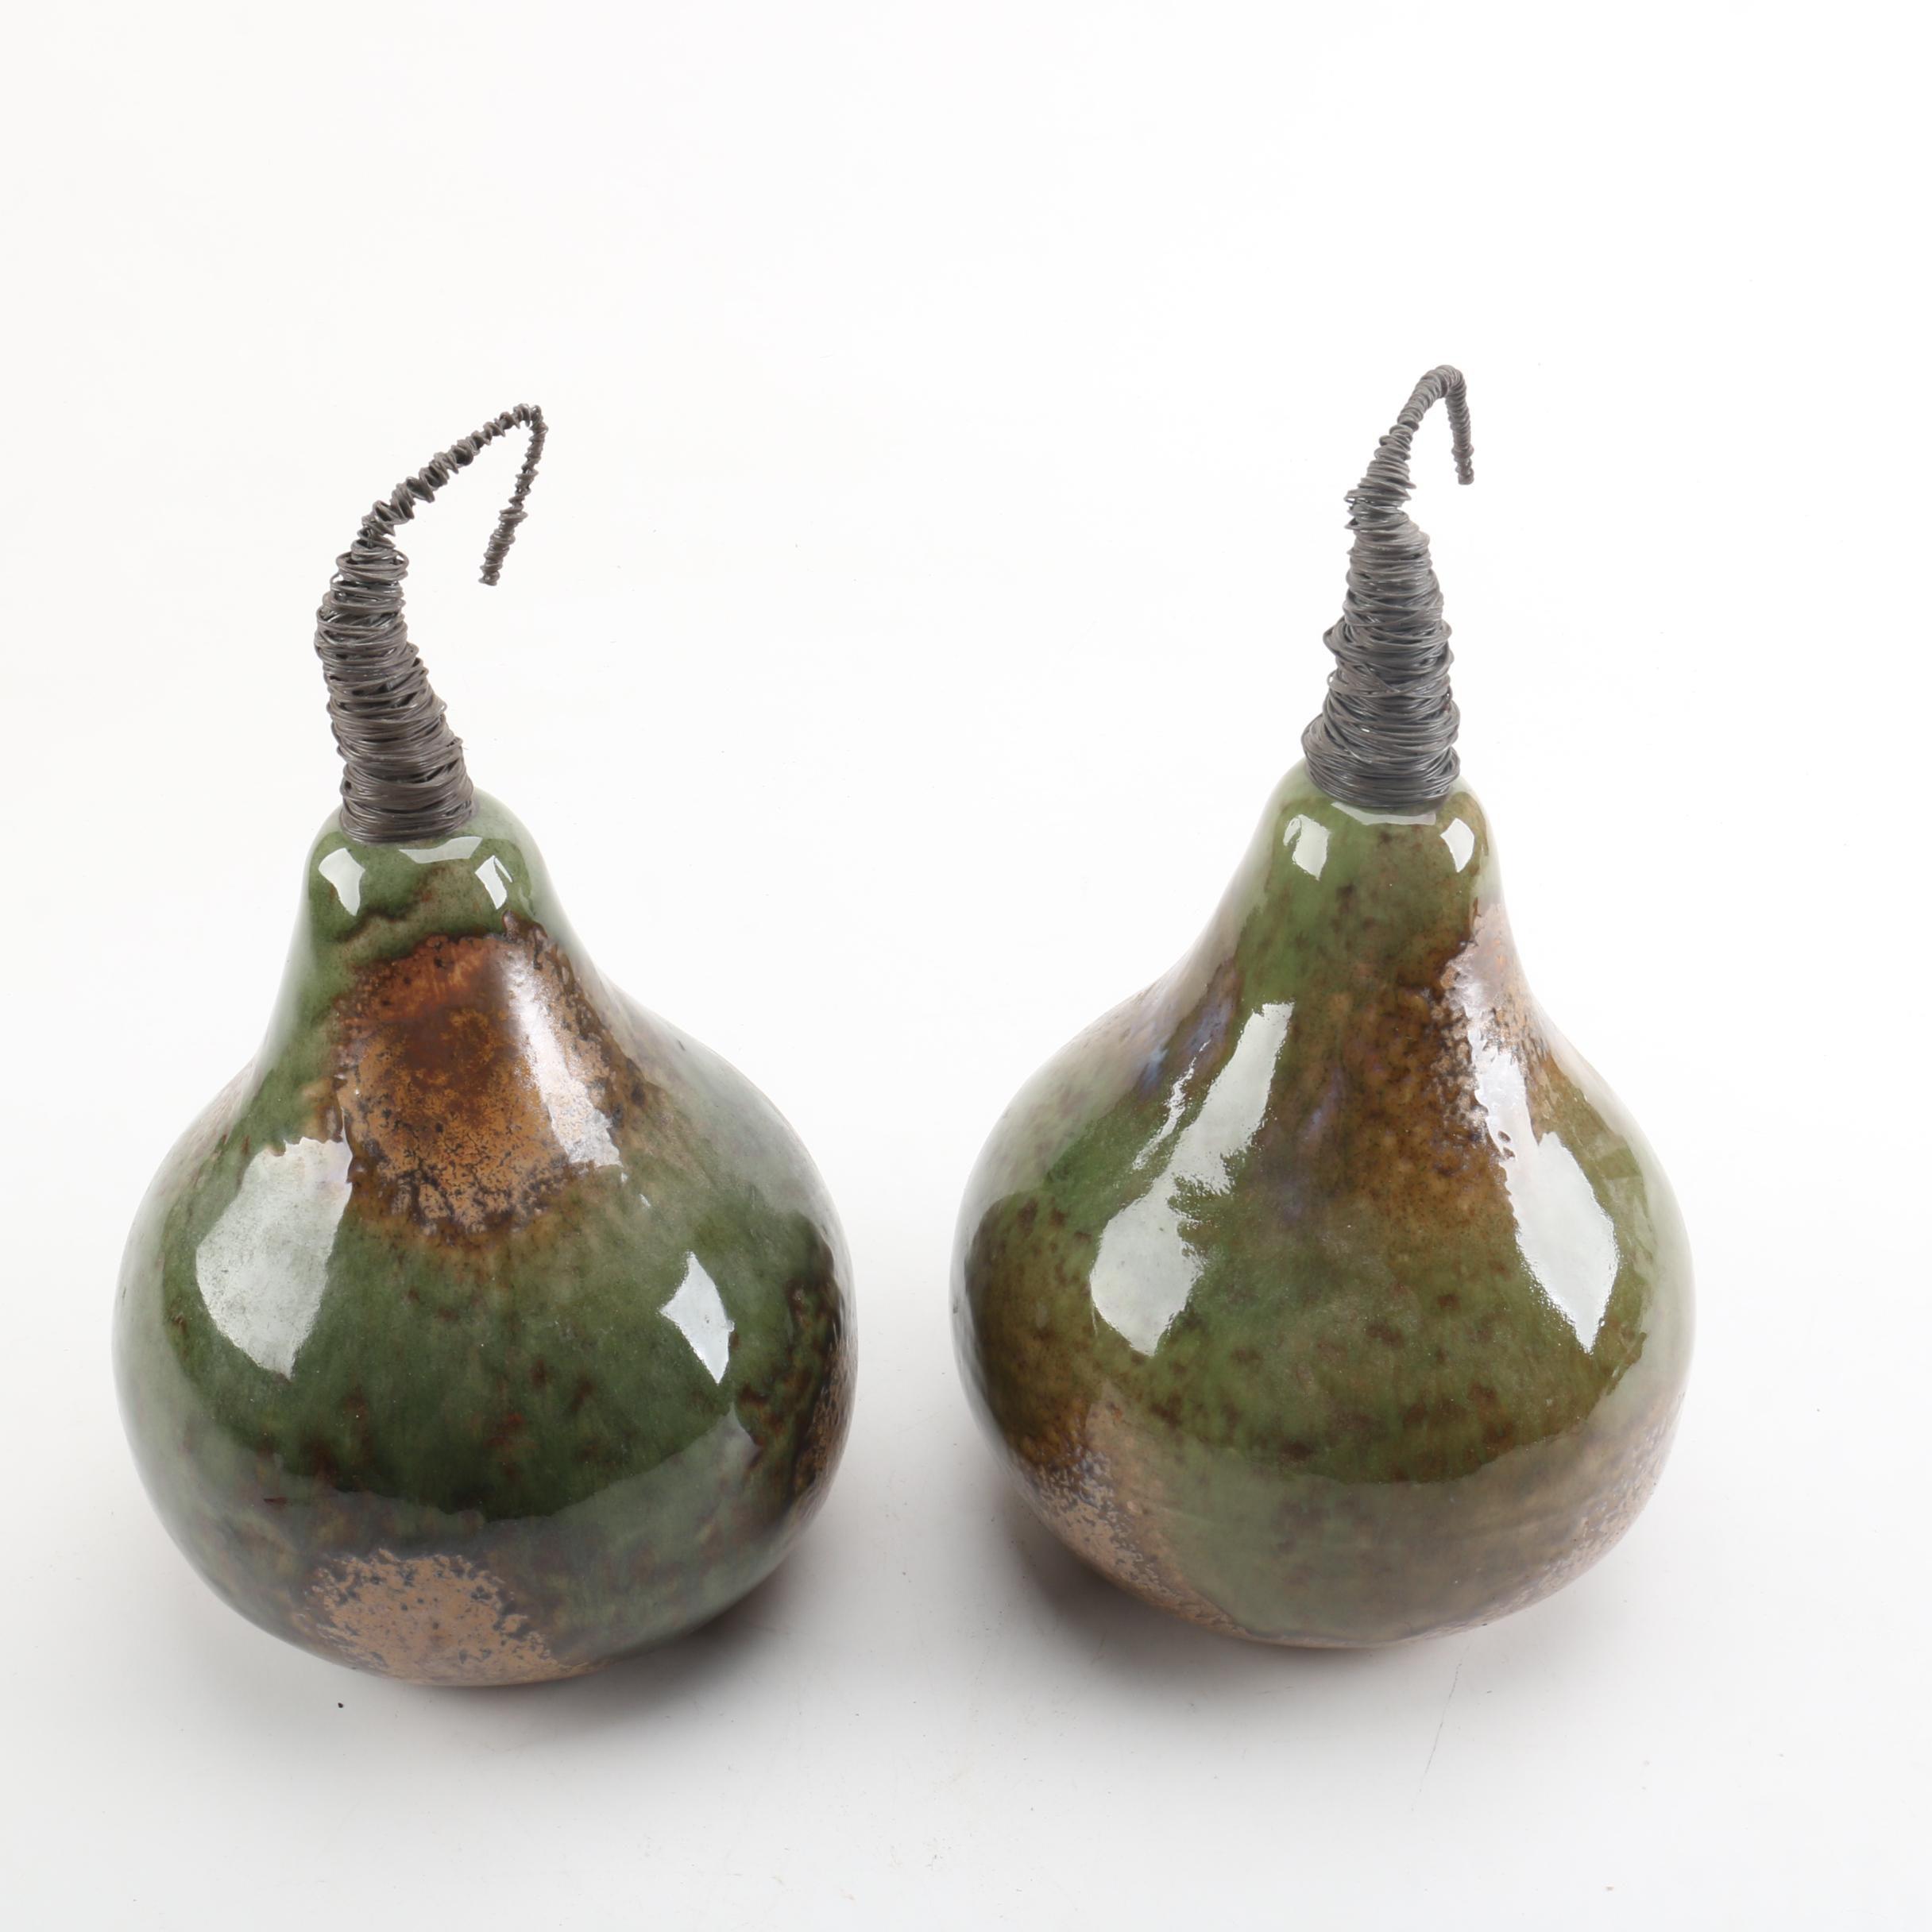 Set of Handbuilt Glazed Ceramic Pears